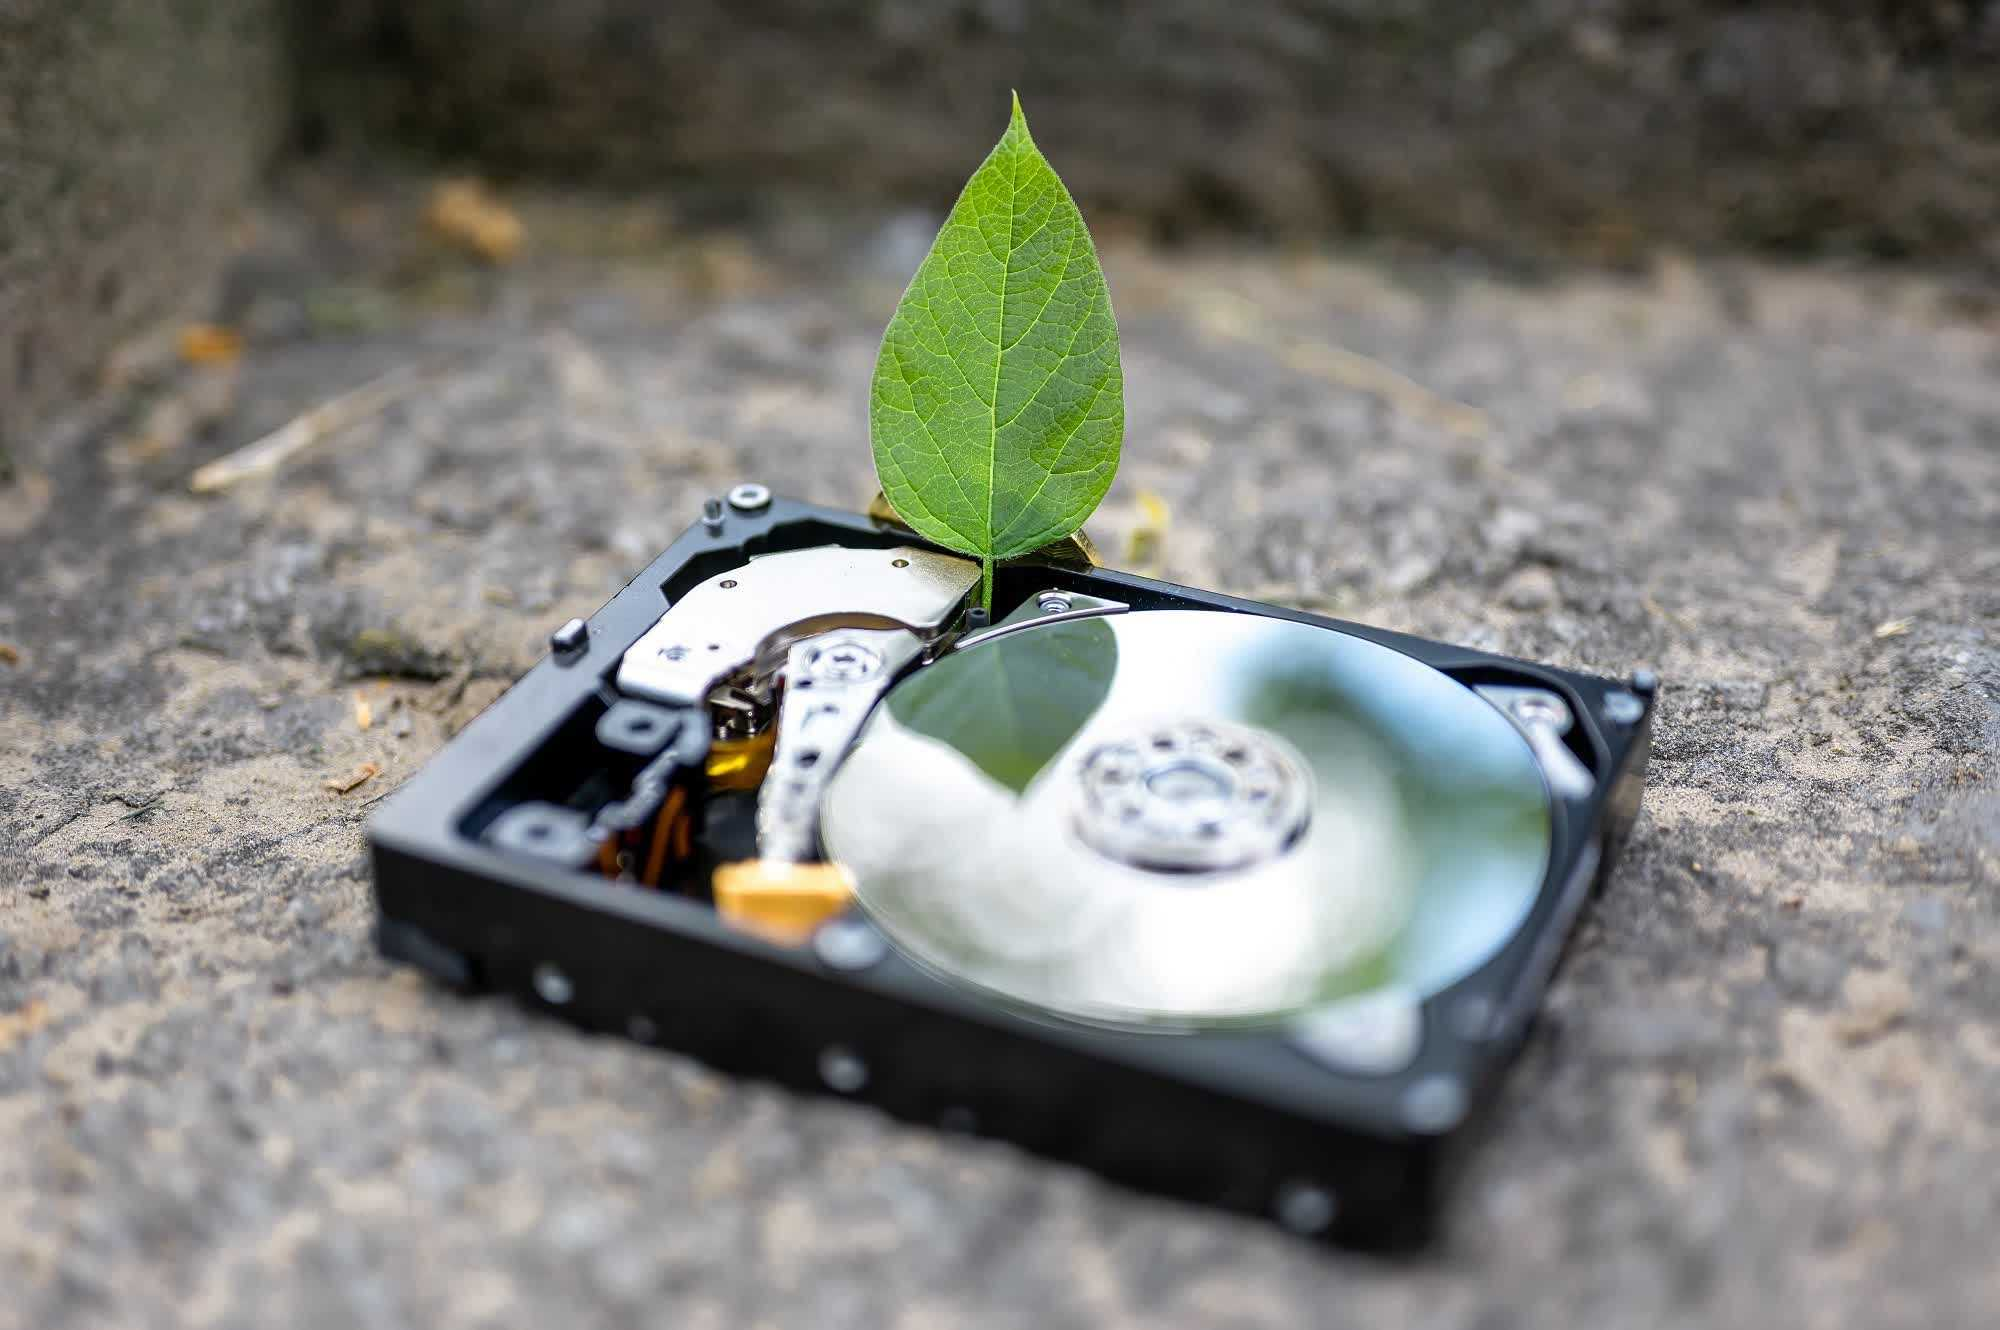 Seagate and Western Digital increase HDD production as Chia sends sales skyrocketing